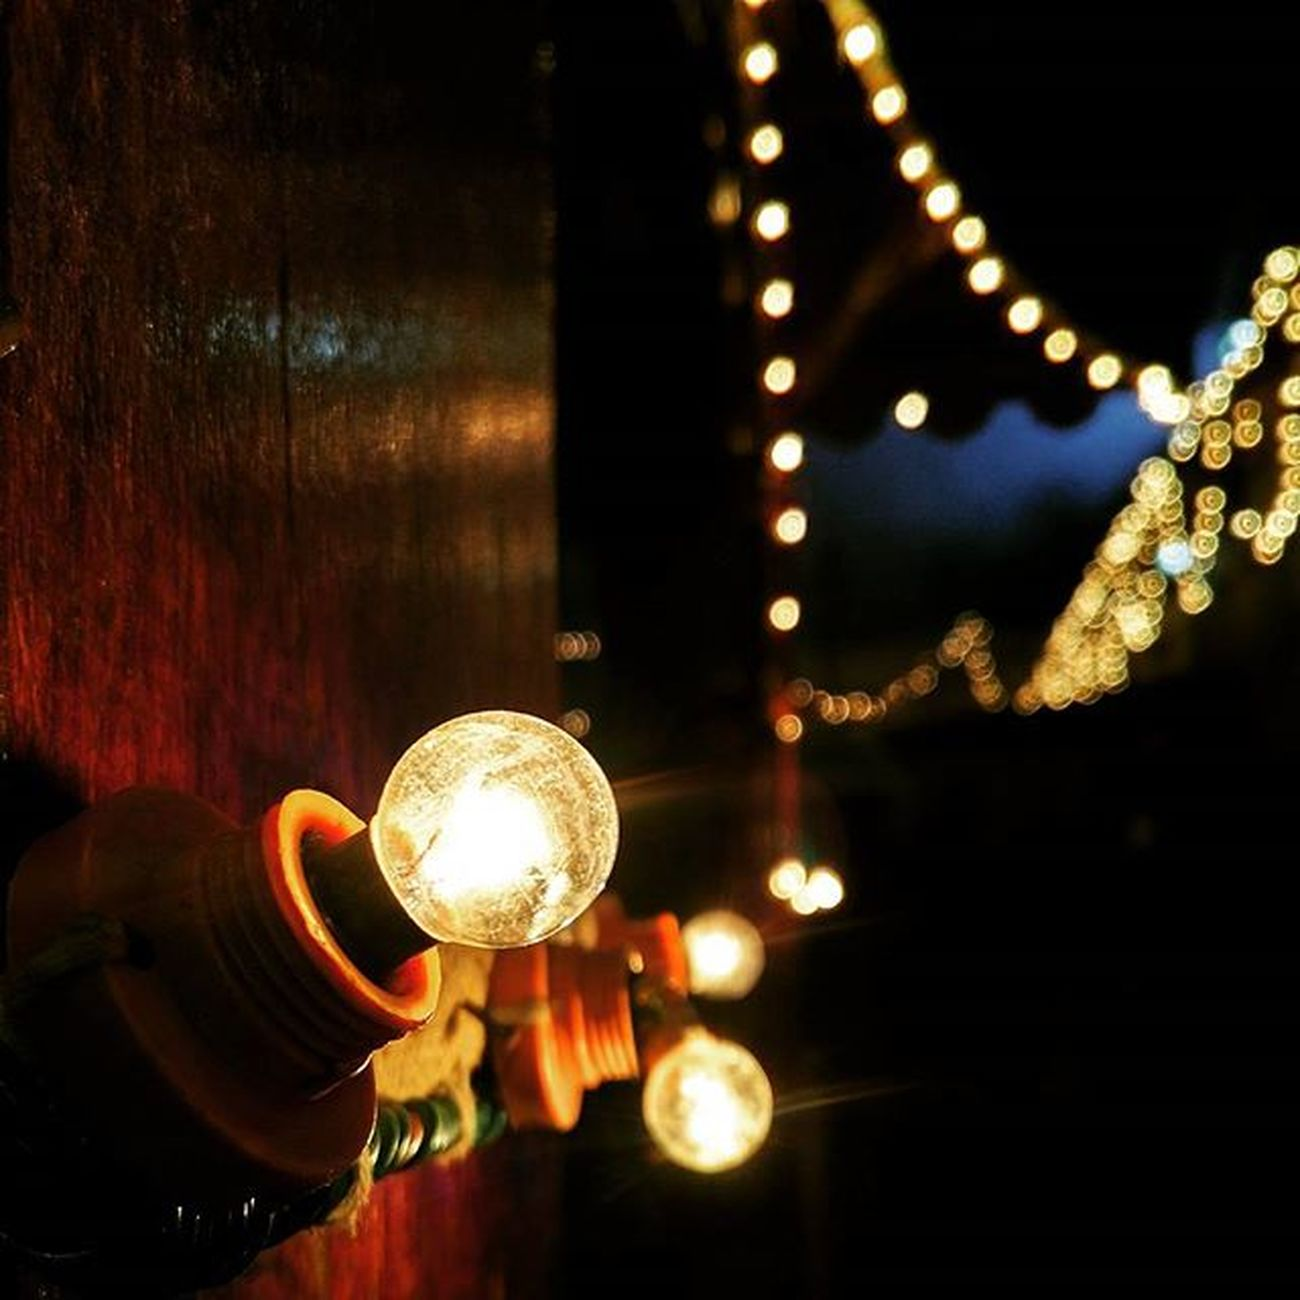 Lightbulbs Decorations MIphotography